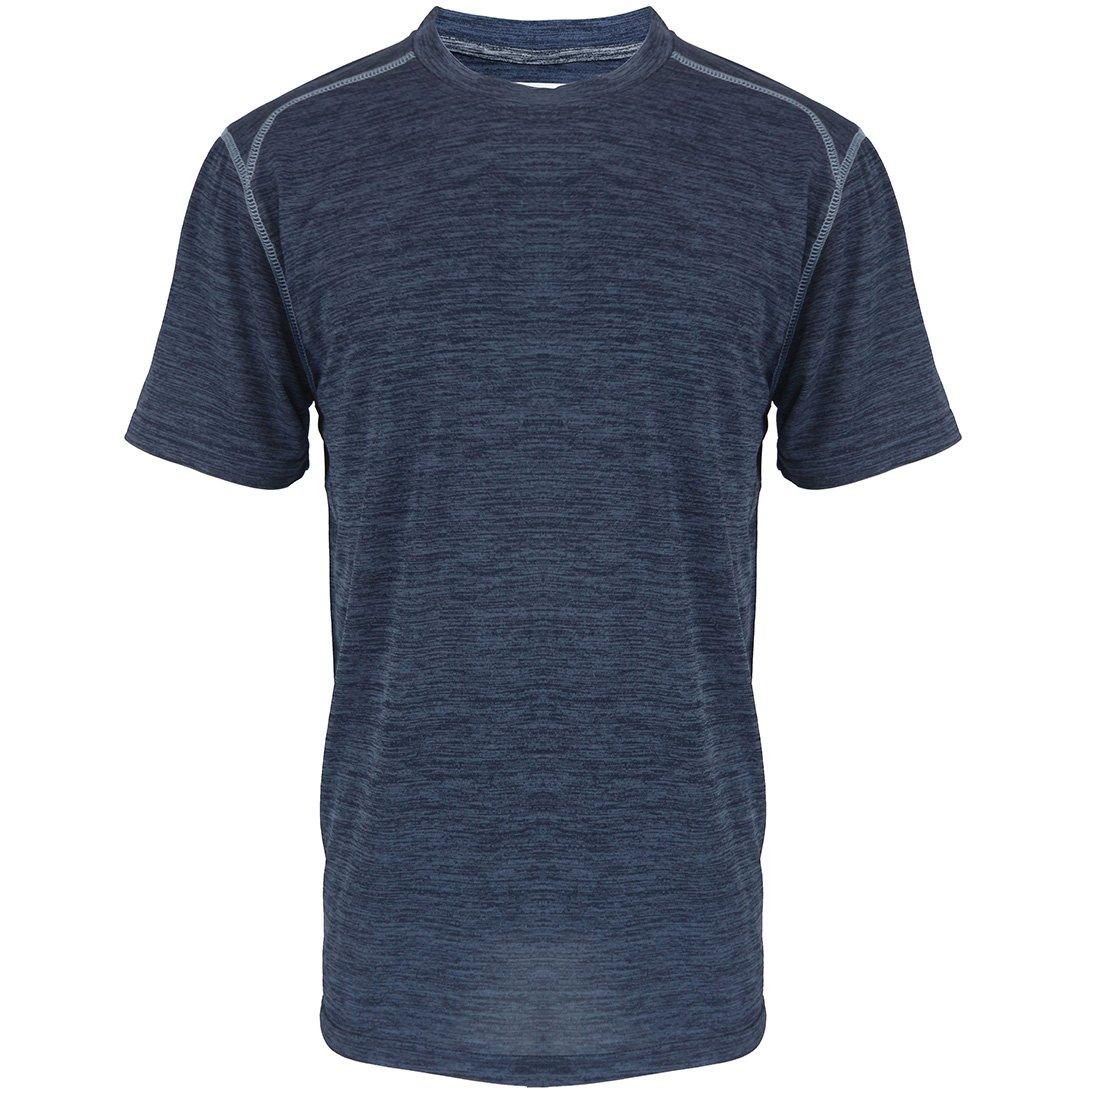 Gary Com Marled Short Sleeve T Shirts For Men Fashion Elastic Good Mens T-Shirts O Crew Neck Casual Work Tee